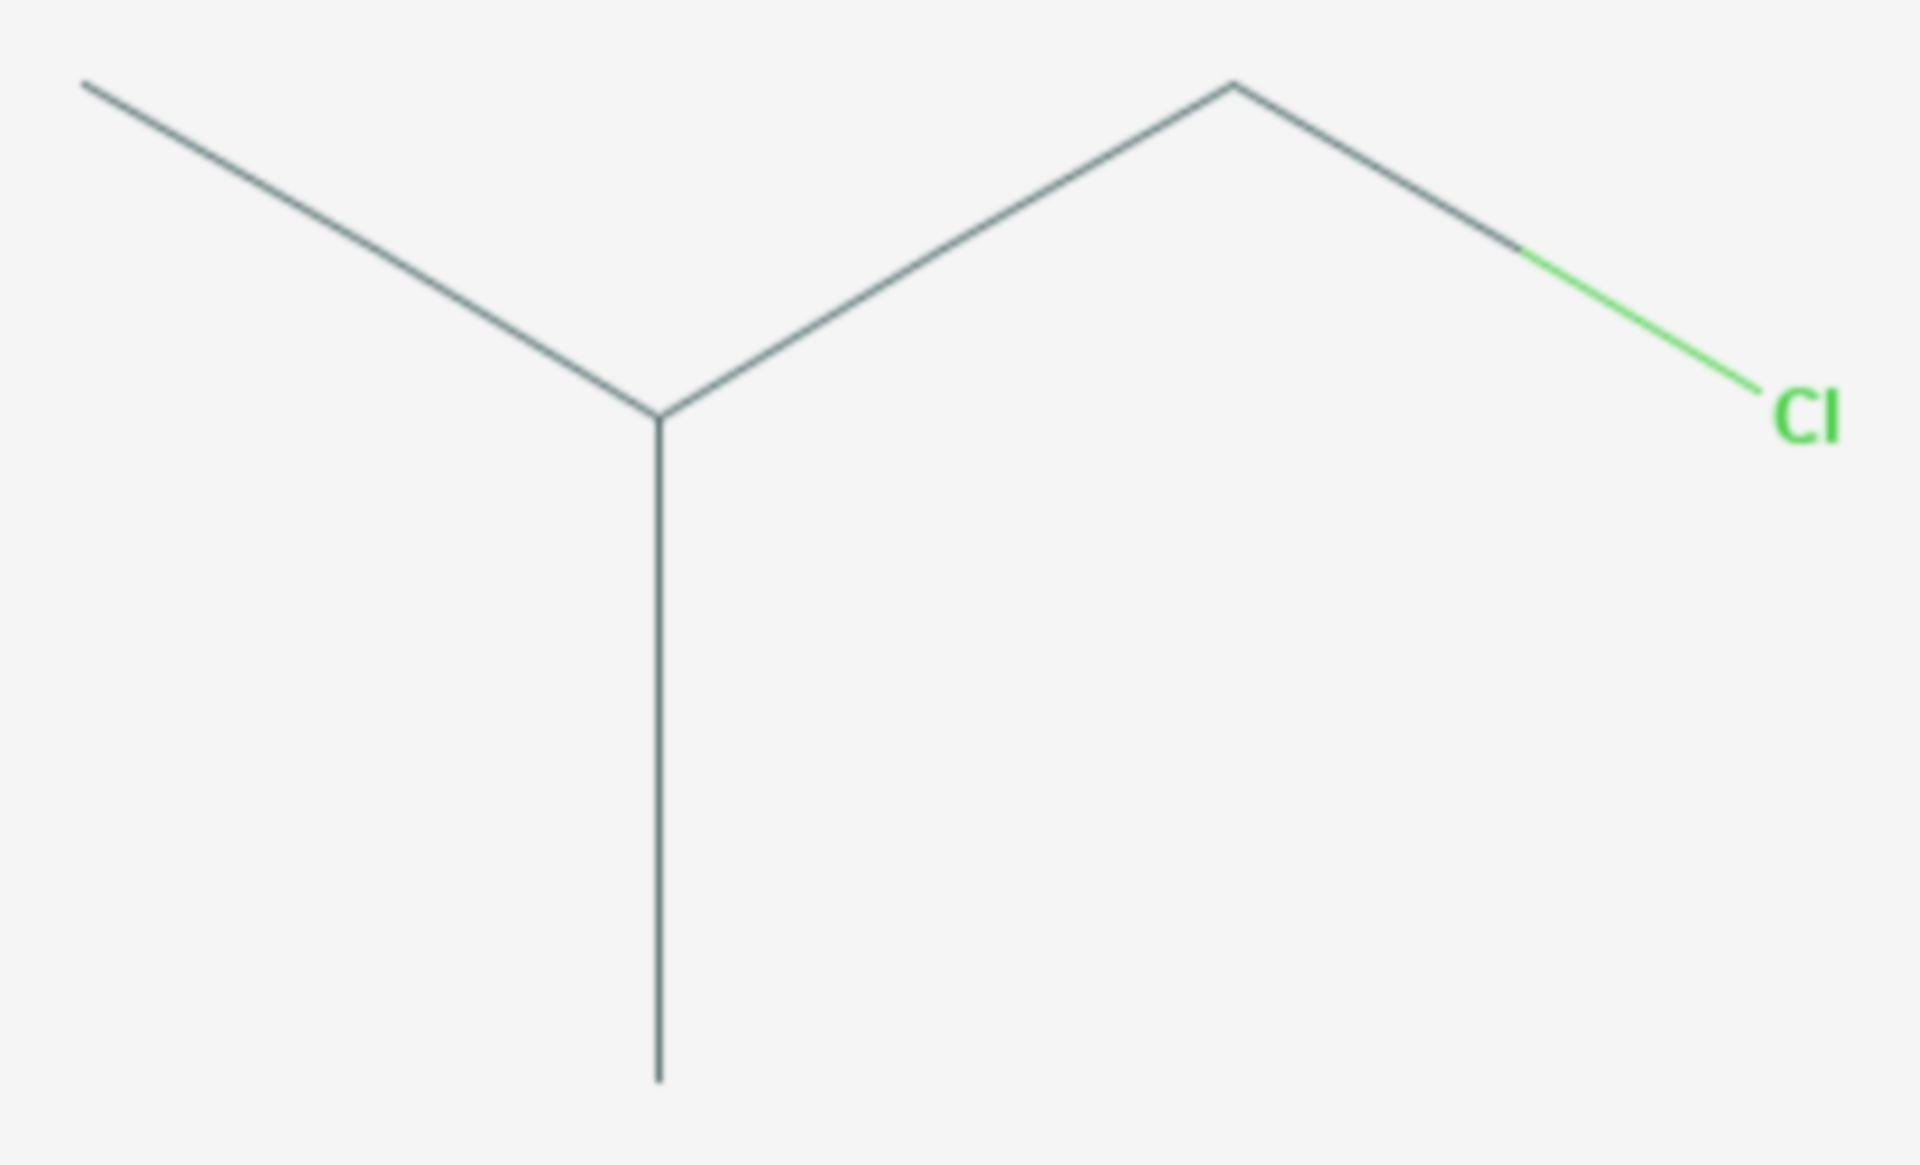 1-Chlor-2-methylpropan (Strukturformel)